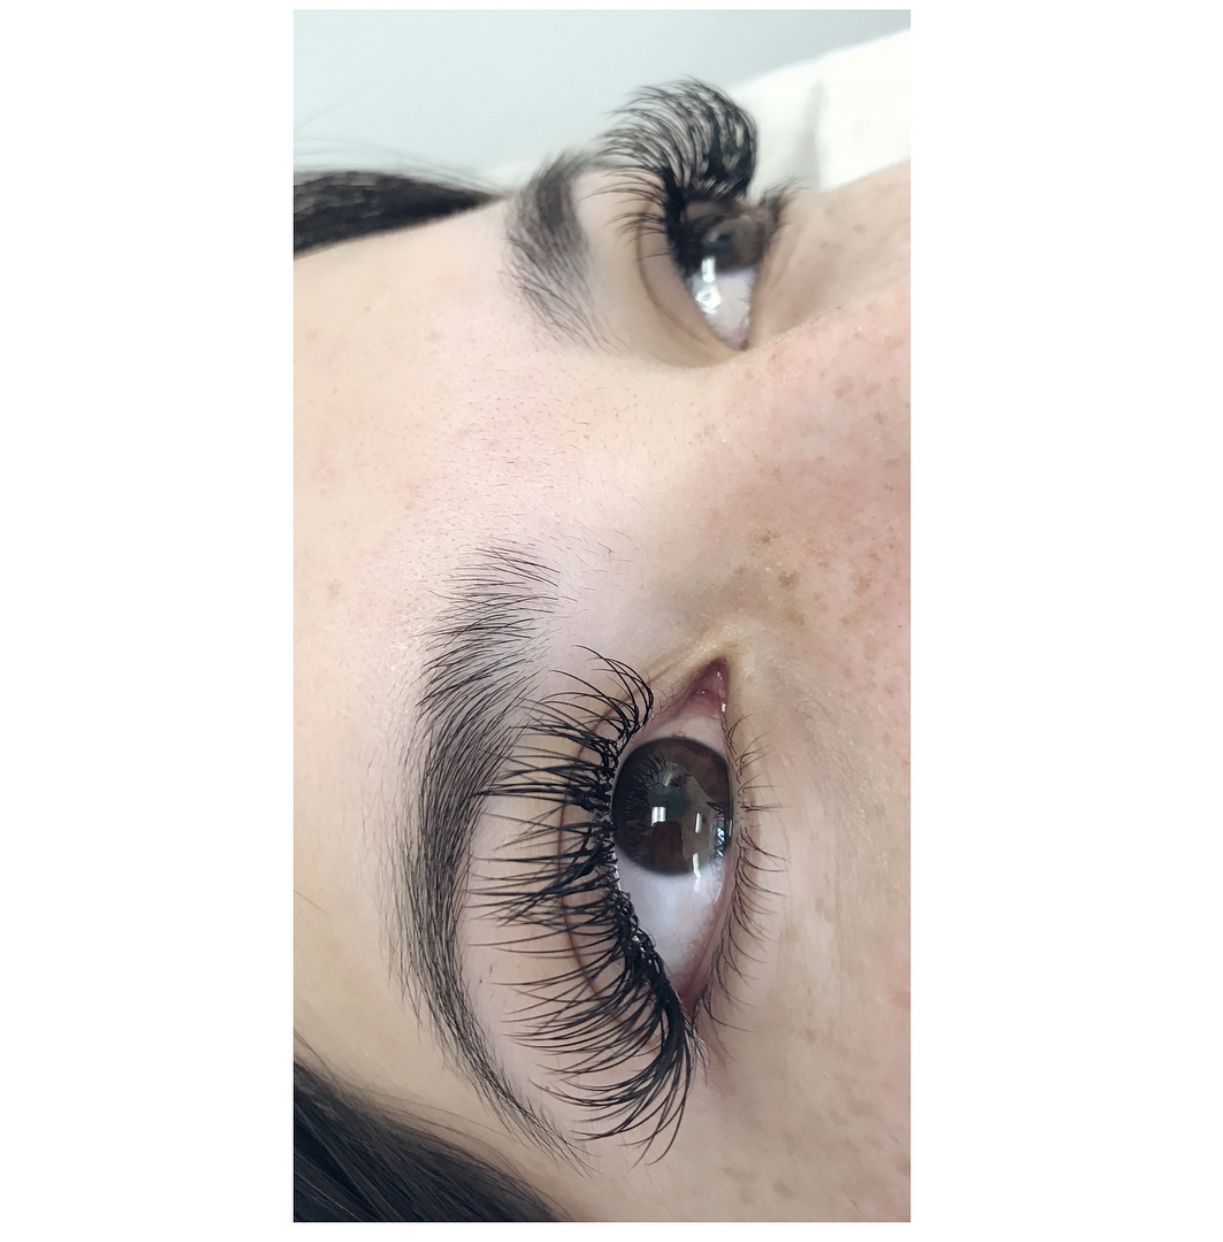 8e62977b0b1 D-Curl   10mm-15mm   .20 thickness #lashextensions #classic #fill #salon  #sanjose